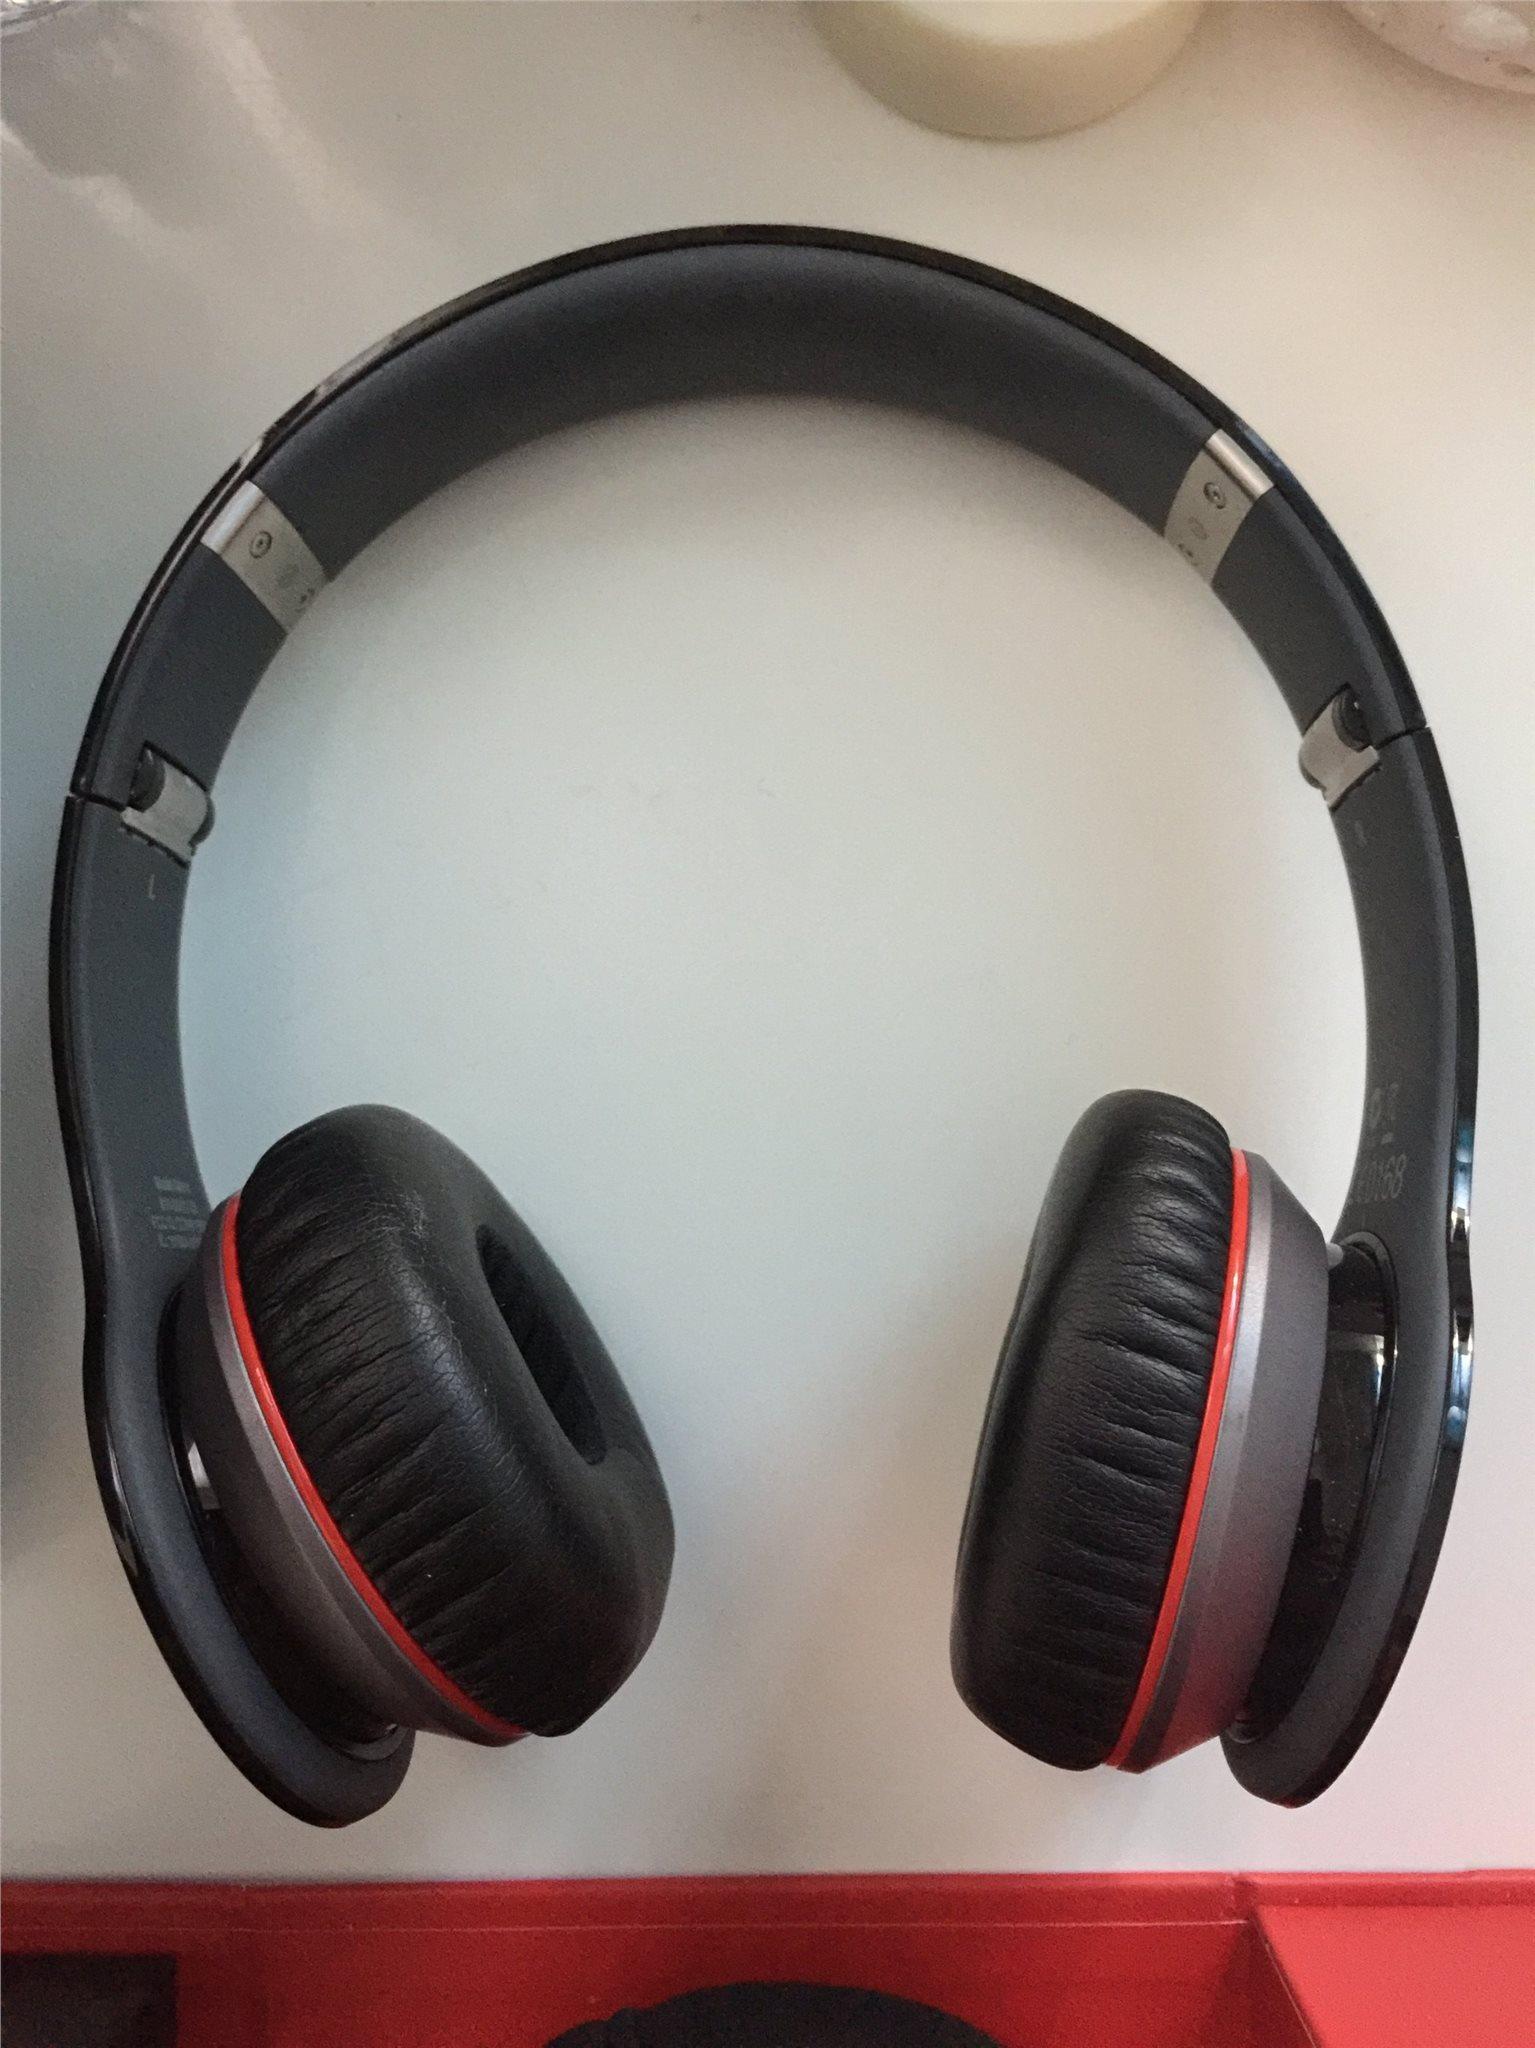 Hörlurar beats wireless beats by dr.dre (341851657) ᐈ Köp på Tradera 10233d8e3d177